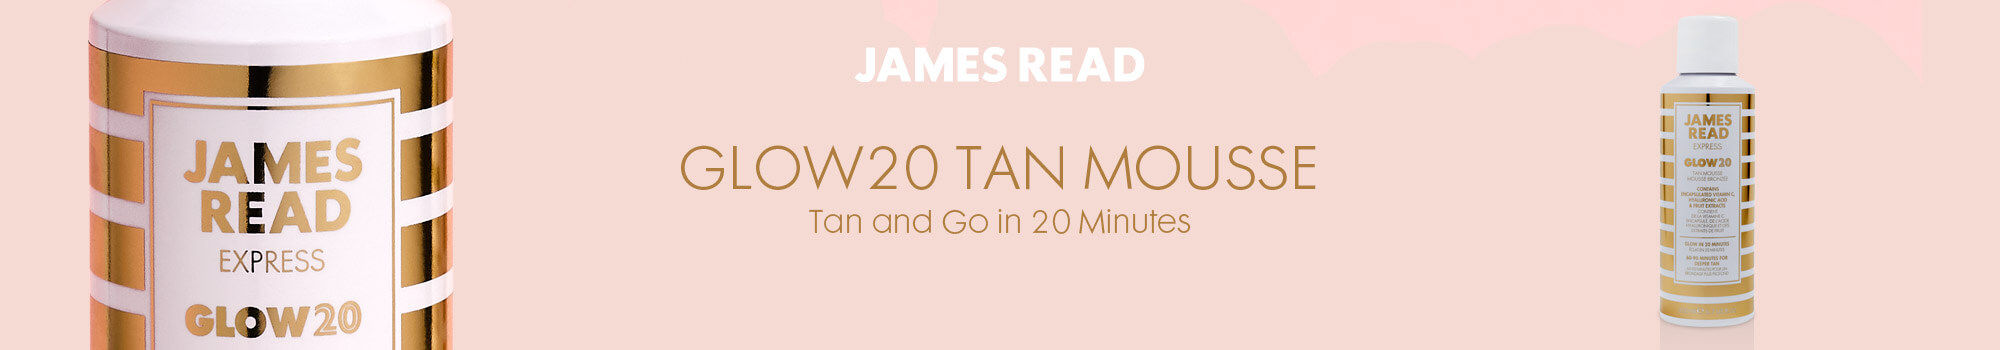 James Read Glow20 Shop Header